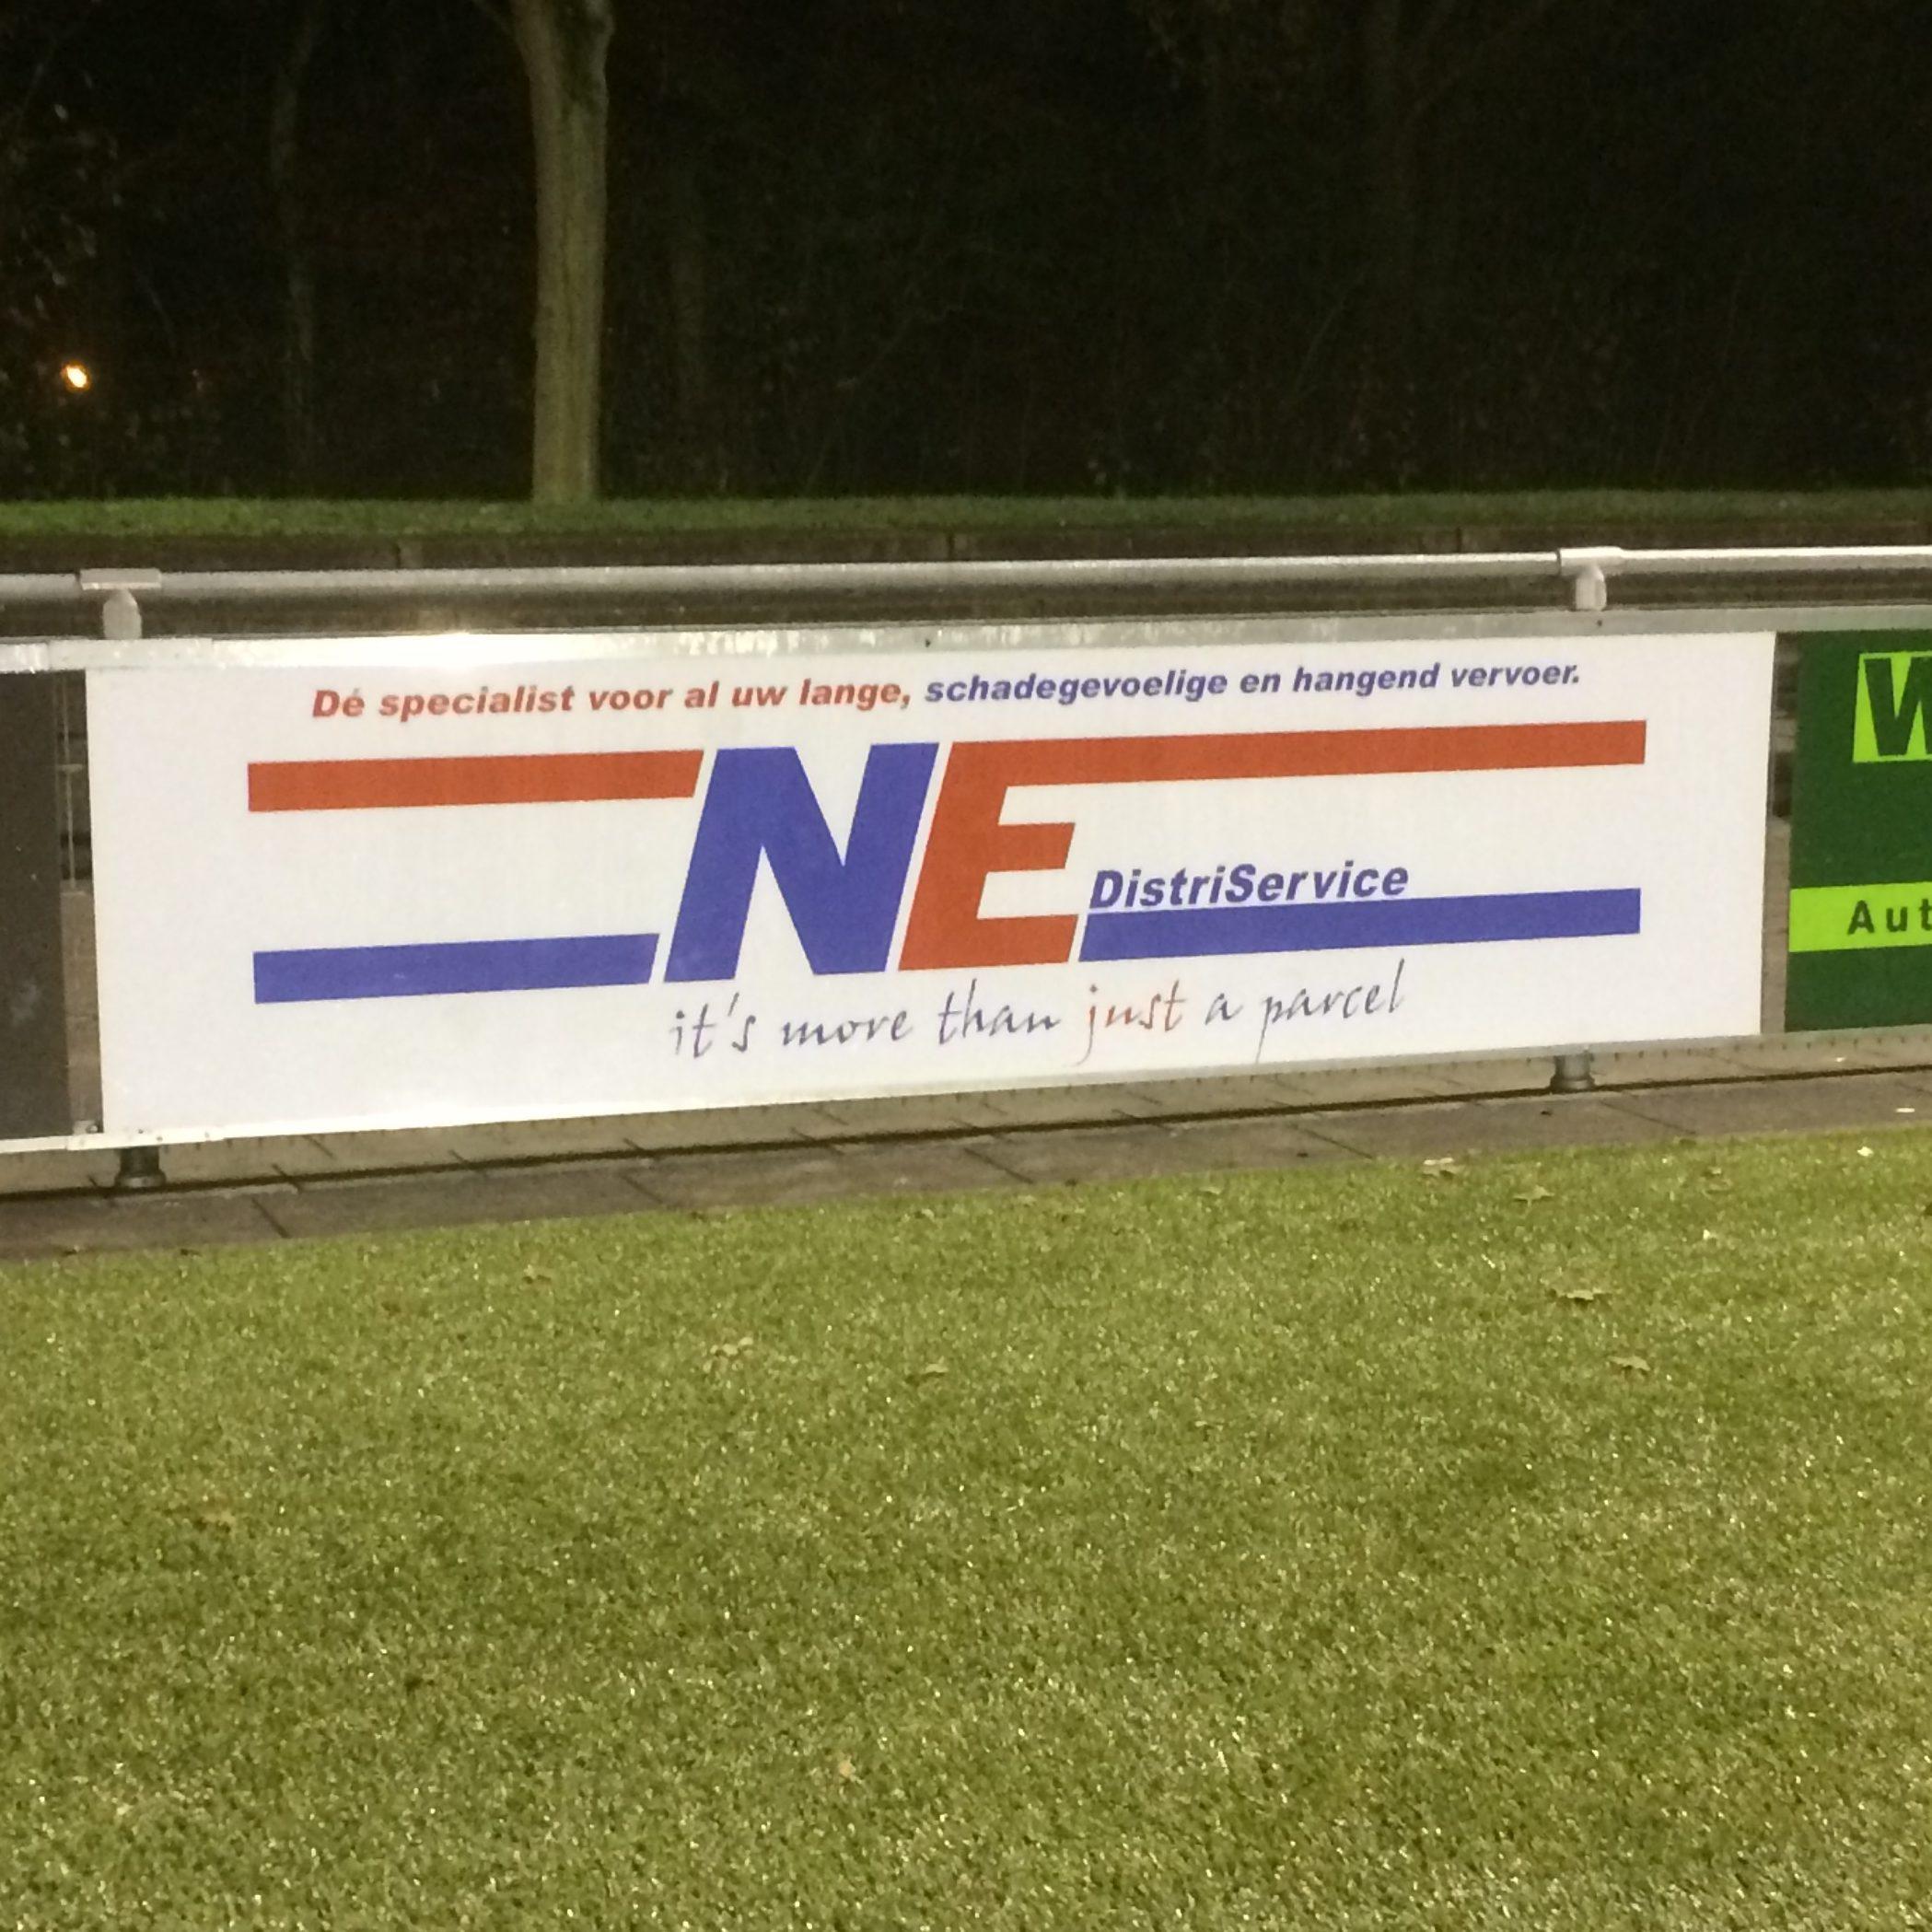 Sponsorbord voetbalvereniging NE Distriservice